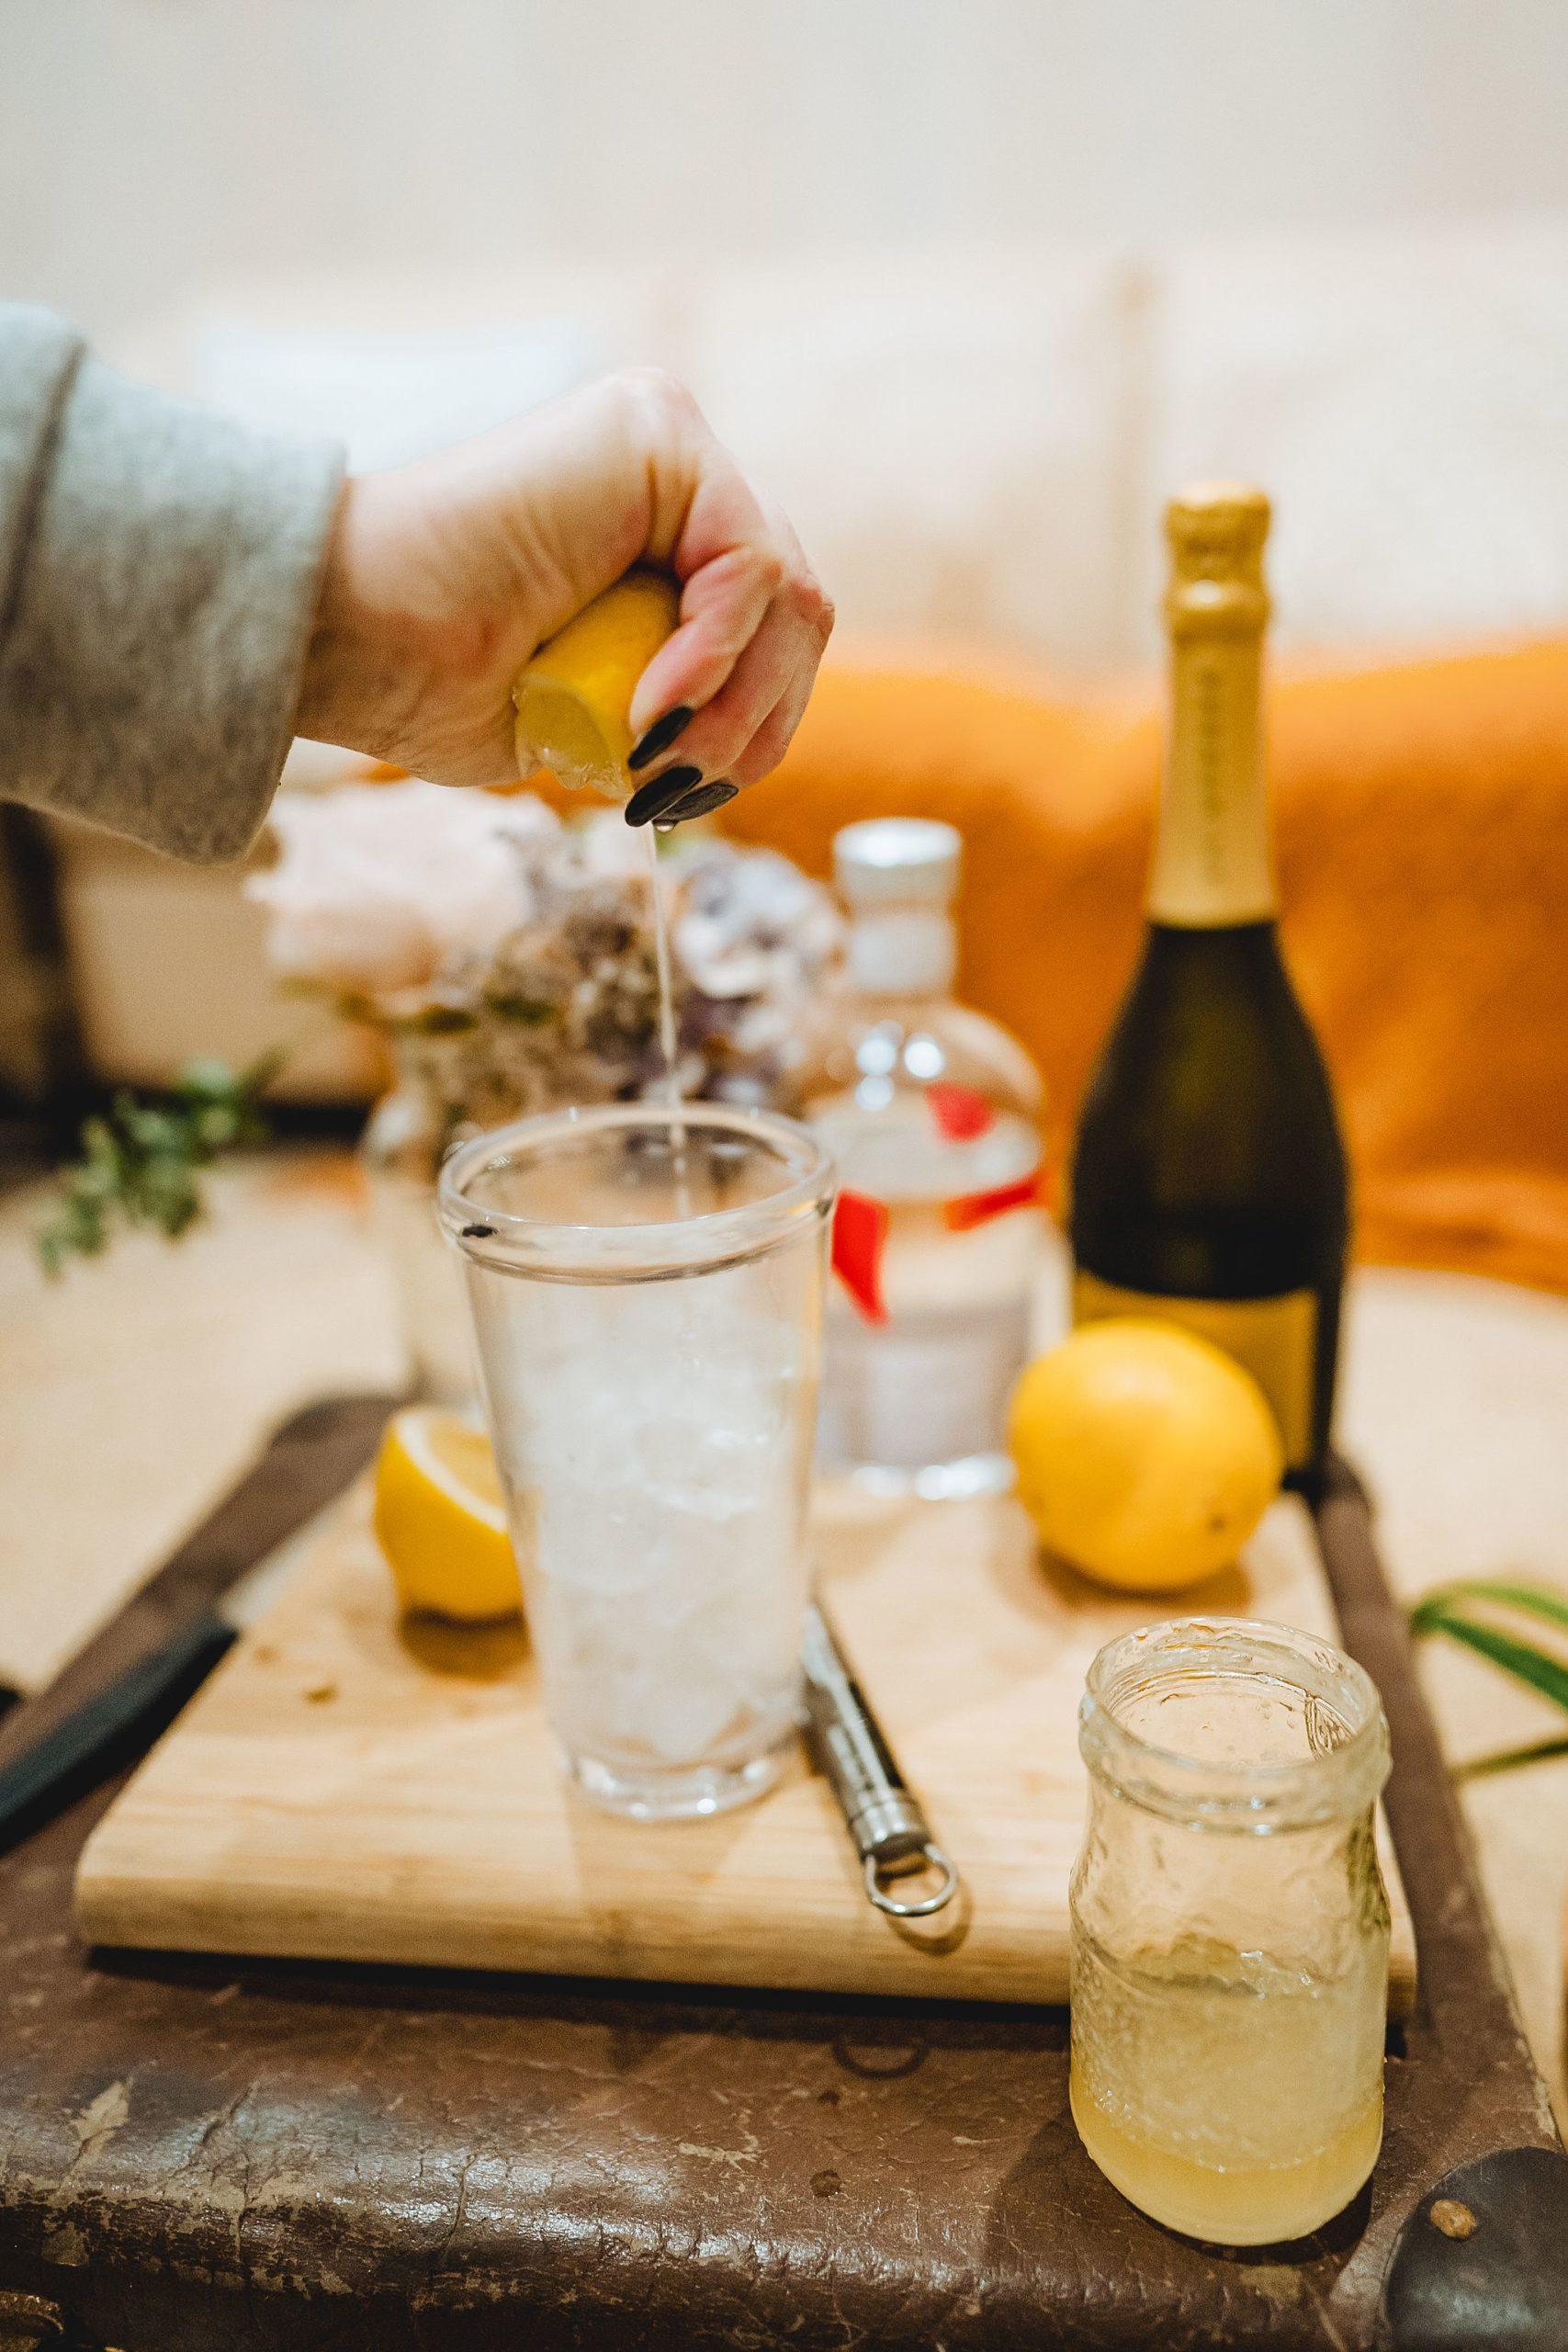 squeezing lemon into a cocktail